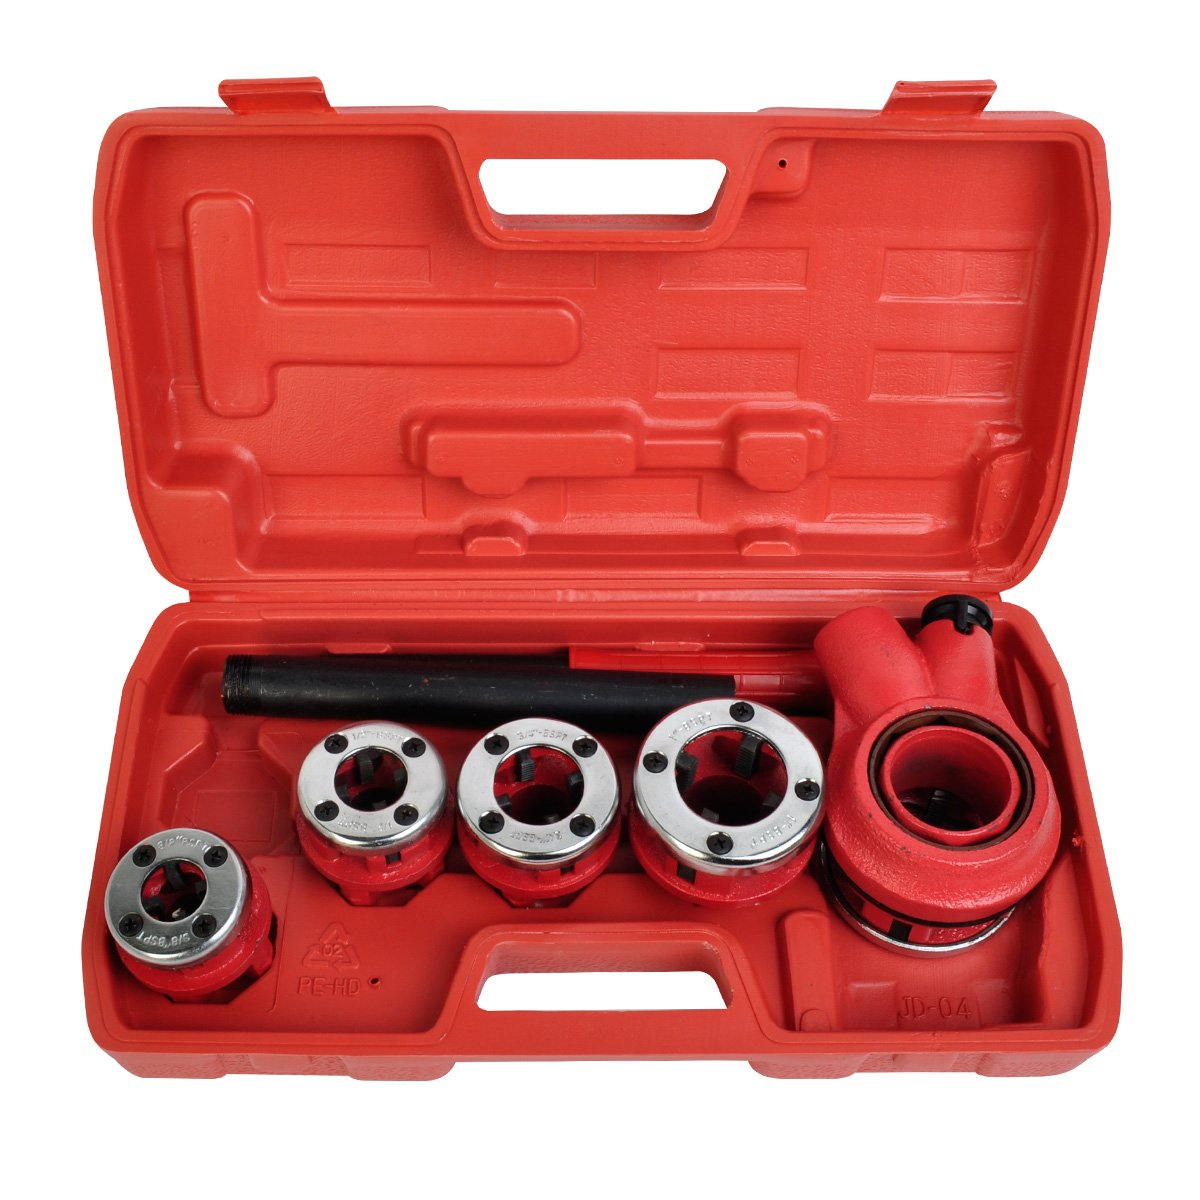 New Ratchet Pipe Threader Kit Set Handle Plumbing Case Ratcheting w/5 Stock Dies Handle Plumbing Case